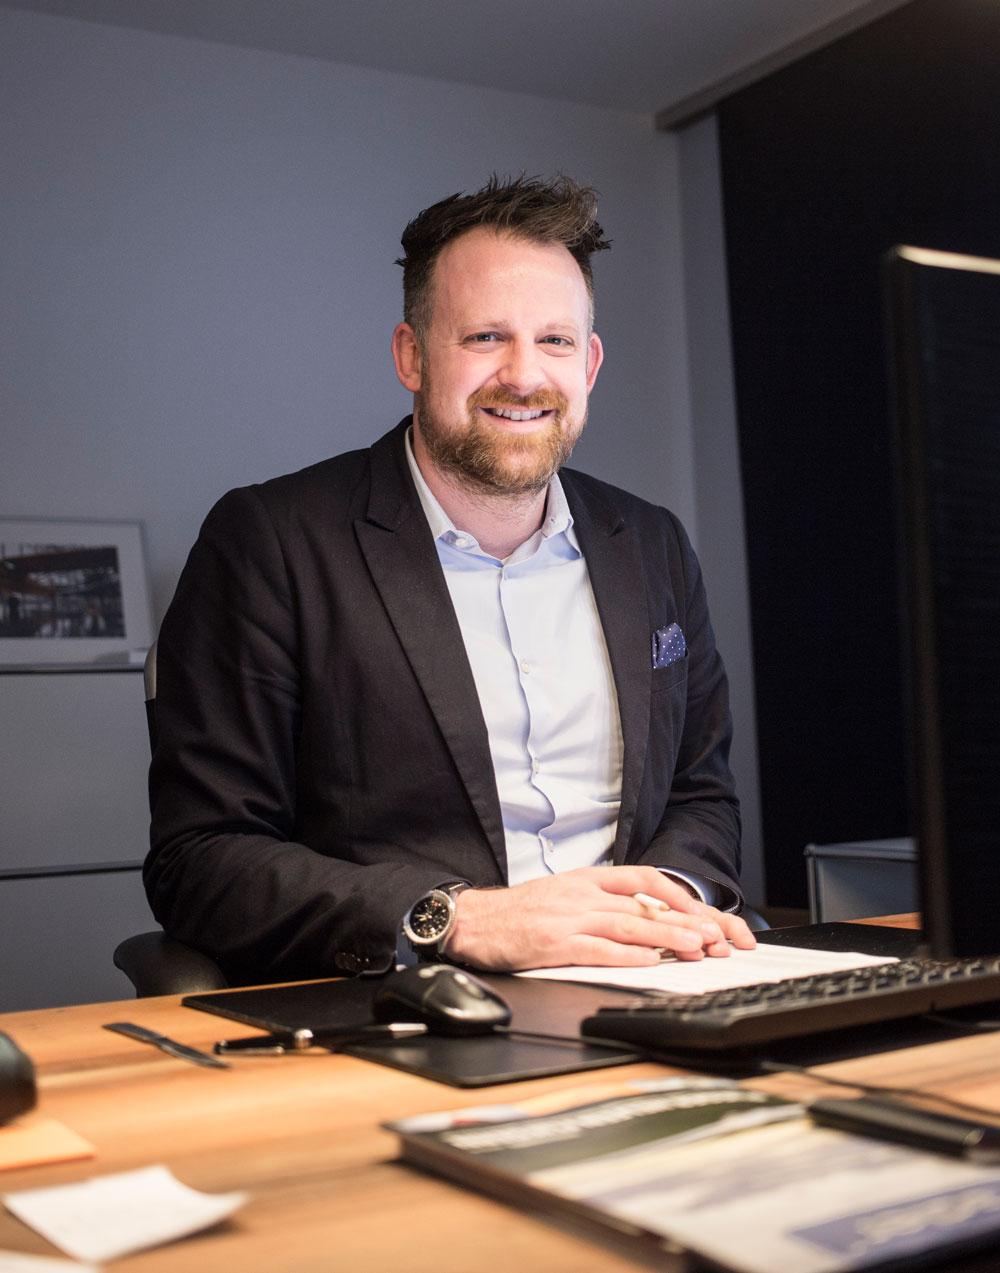 schlafzimmer-interview-frank-wuerthner-decohome.de_